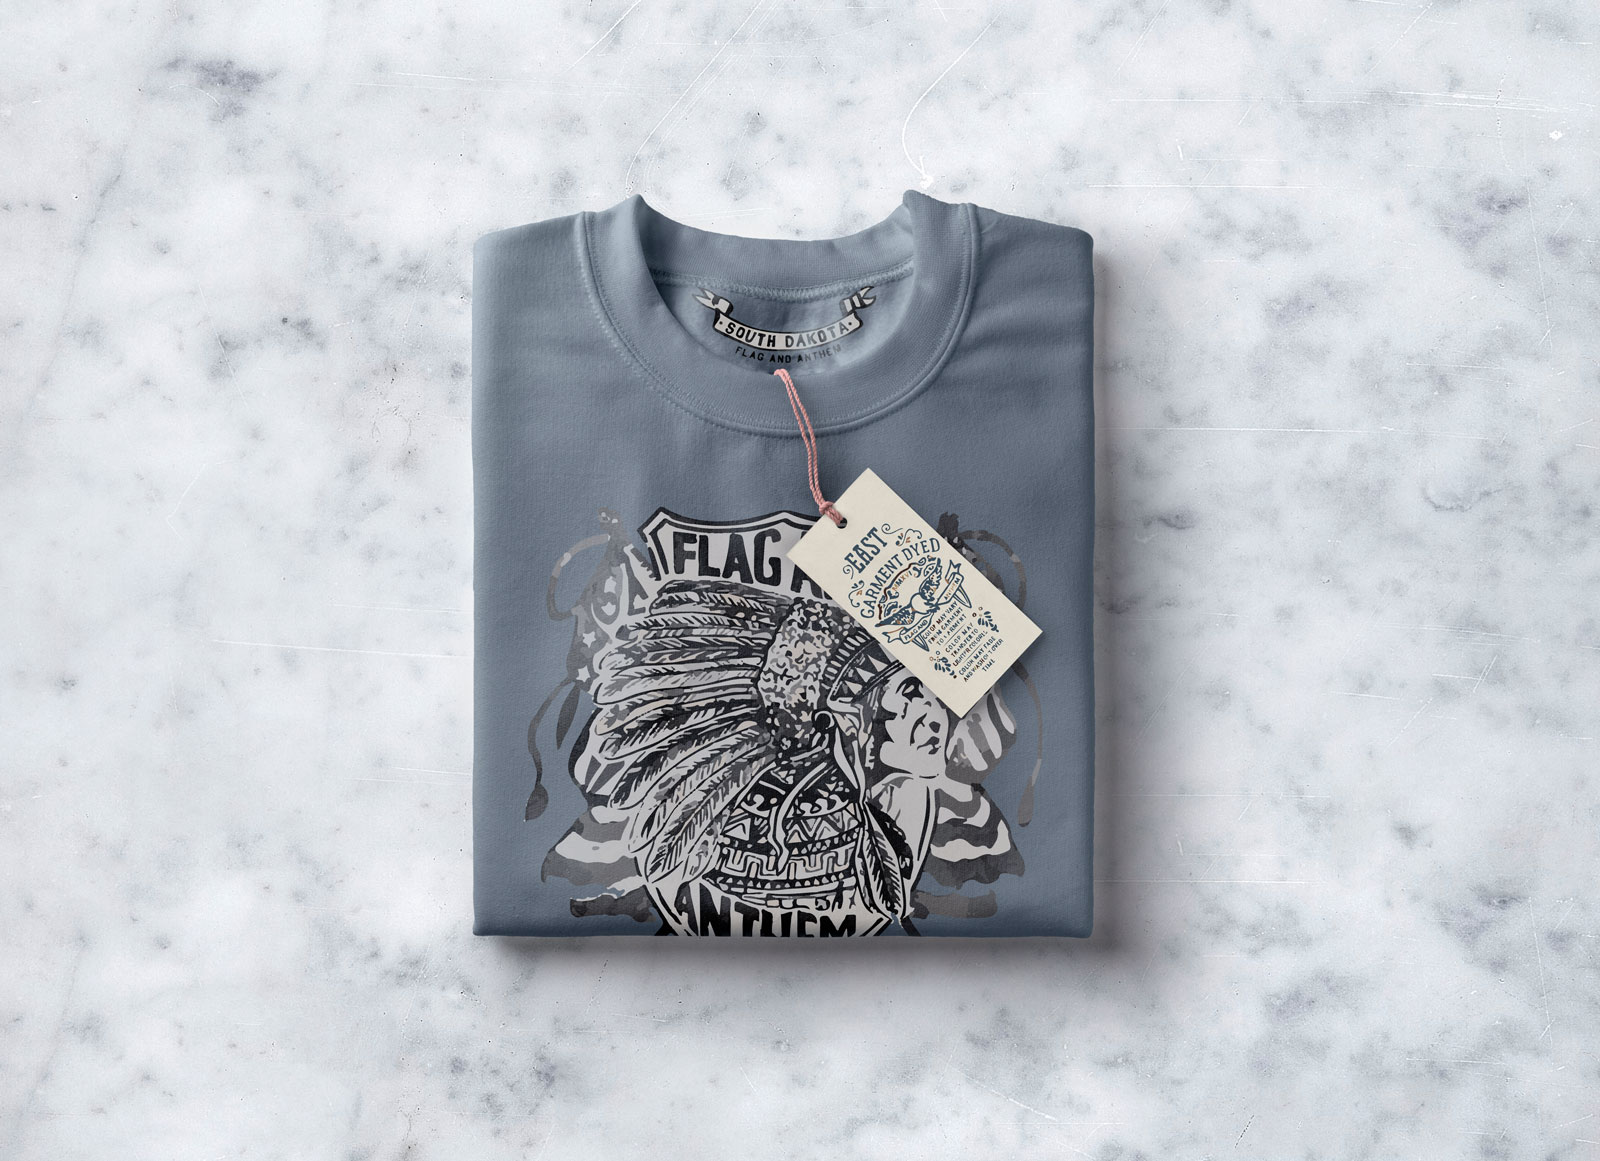 Free Folded T Shirt With Tag Mockup Psd Good Mockups